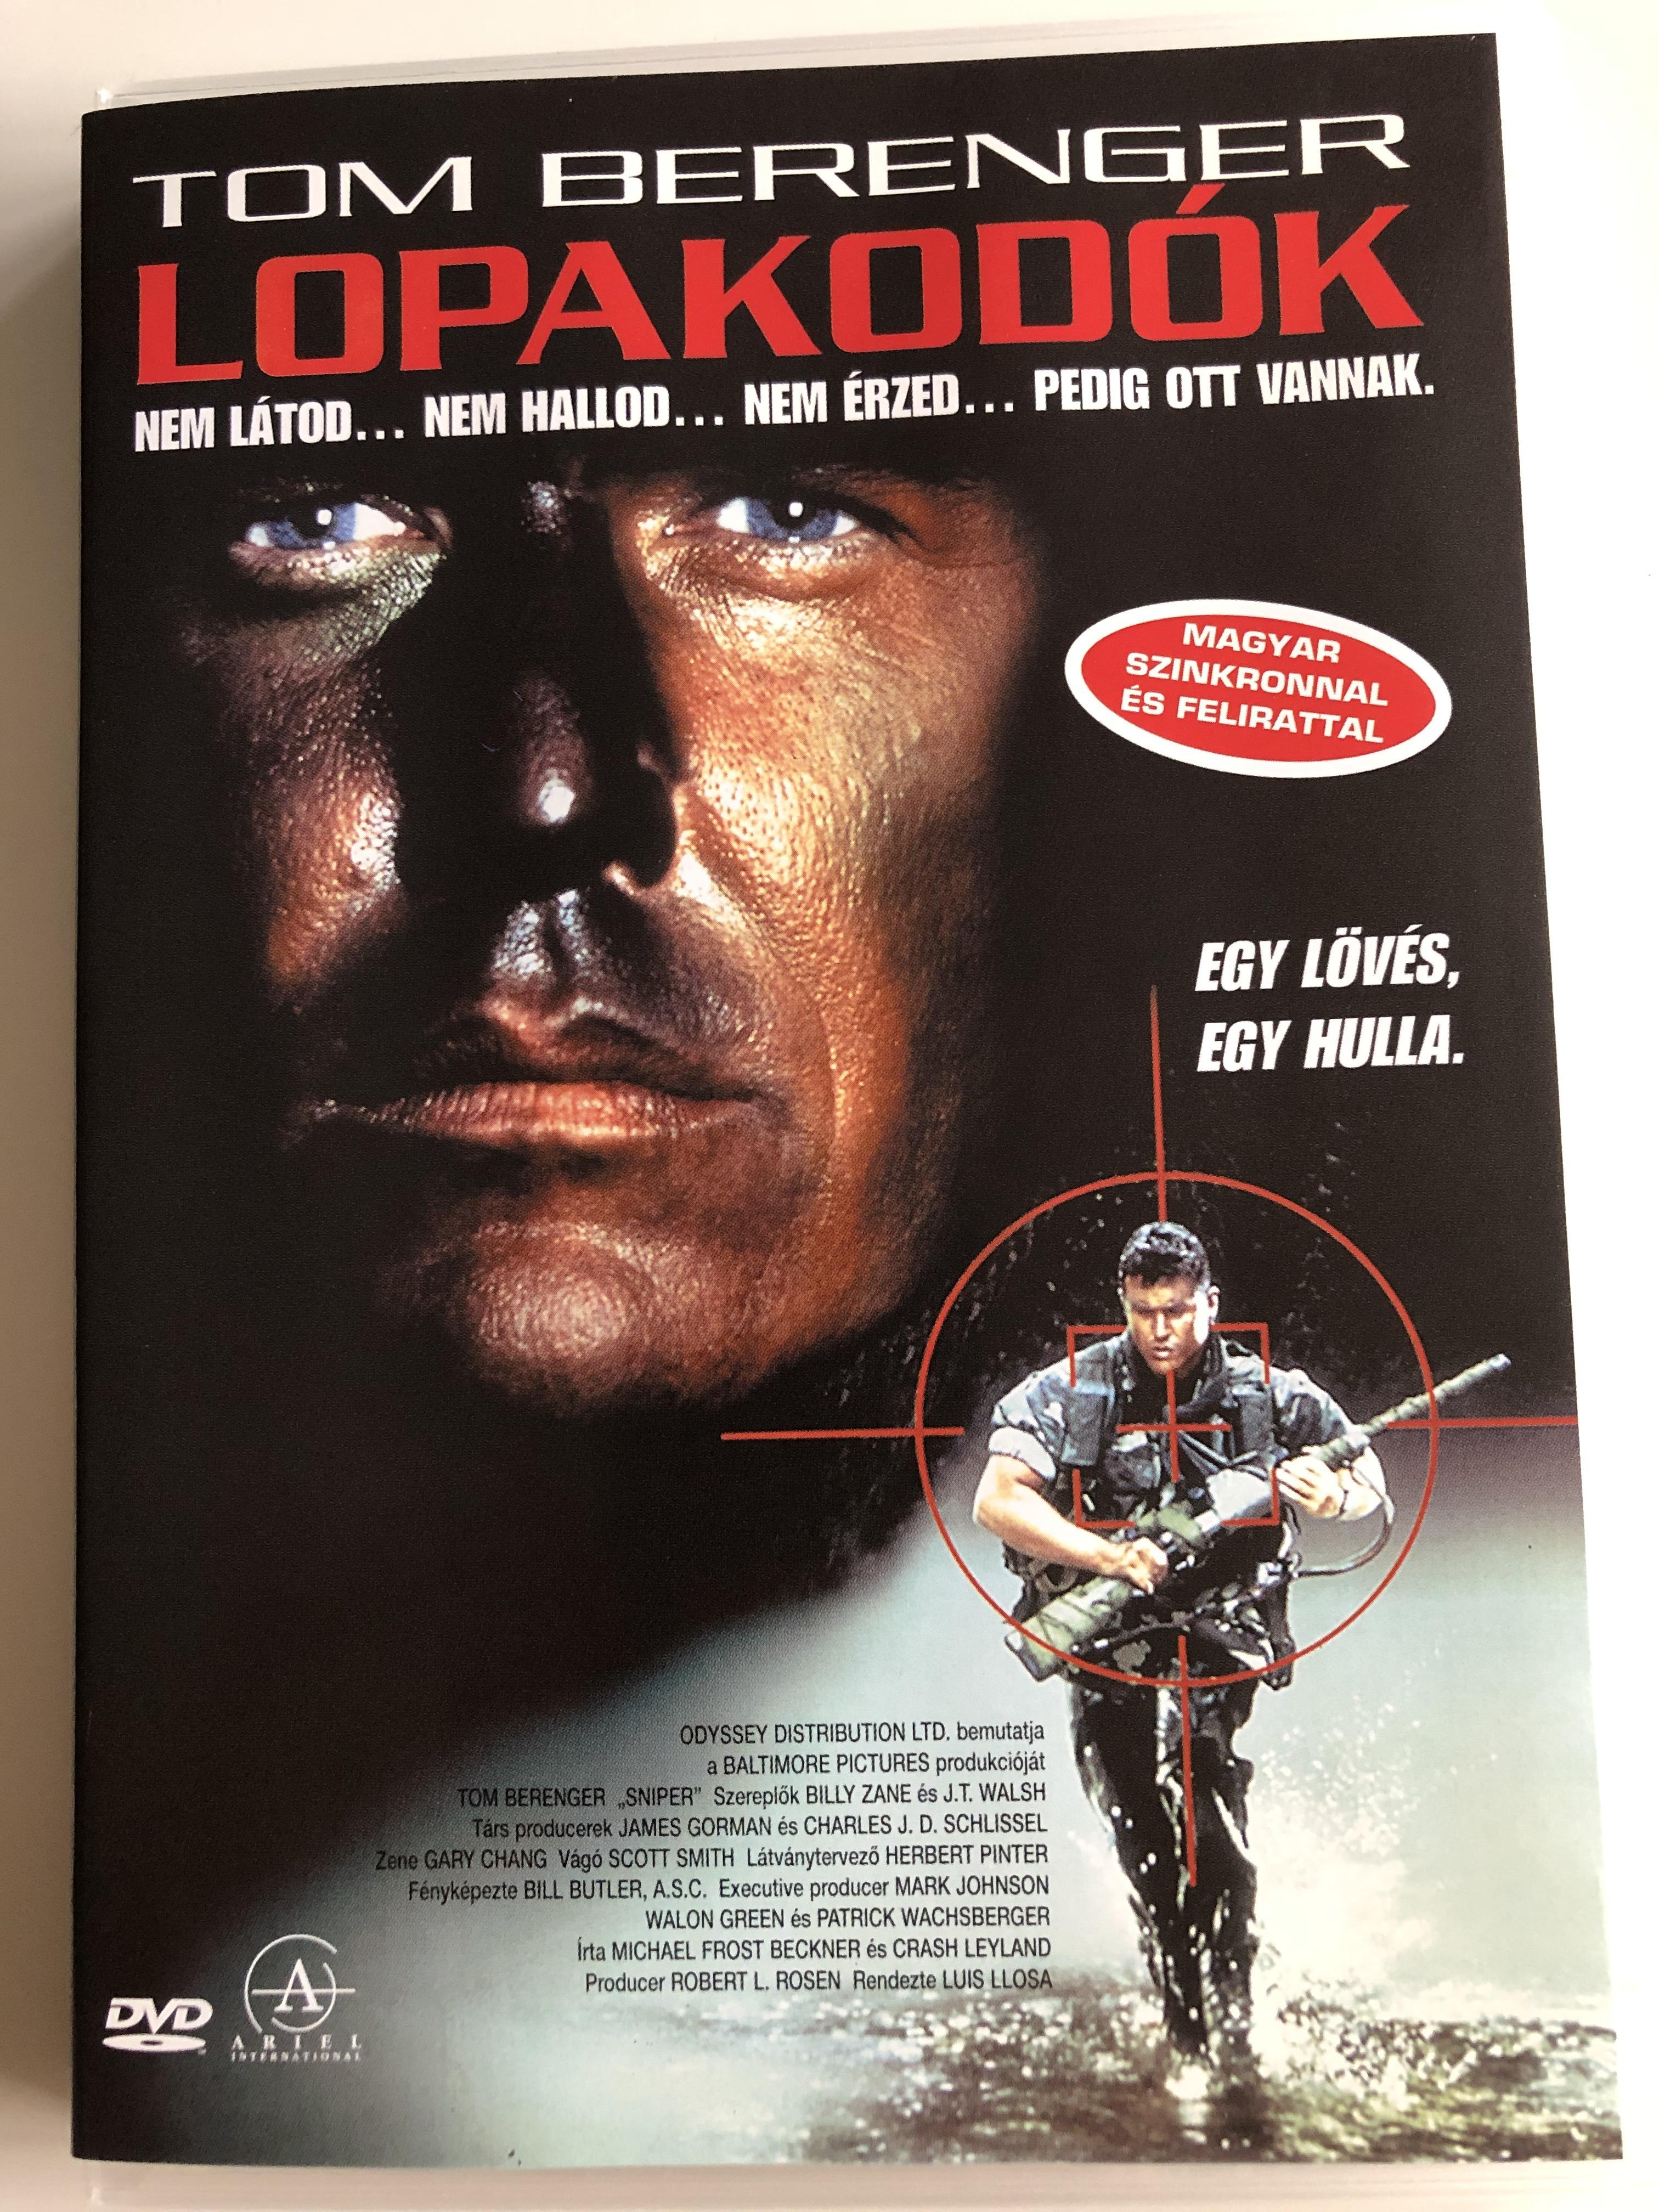 sniper-dvd-1993-lopakod-k-directed-by-luis-llosa-starring-tom-berenger-billy-zane-j.t.-walsh-1-.jpg